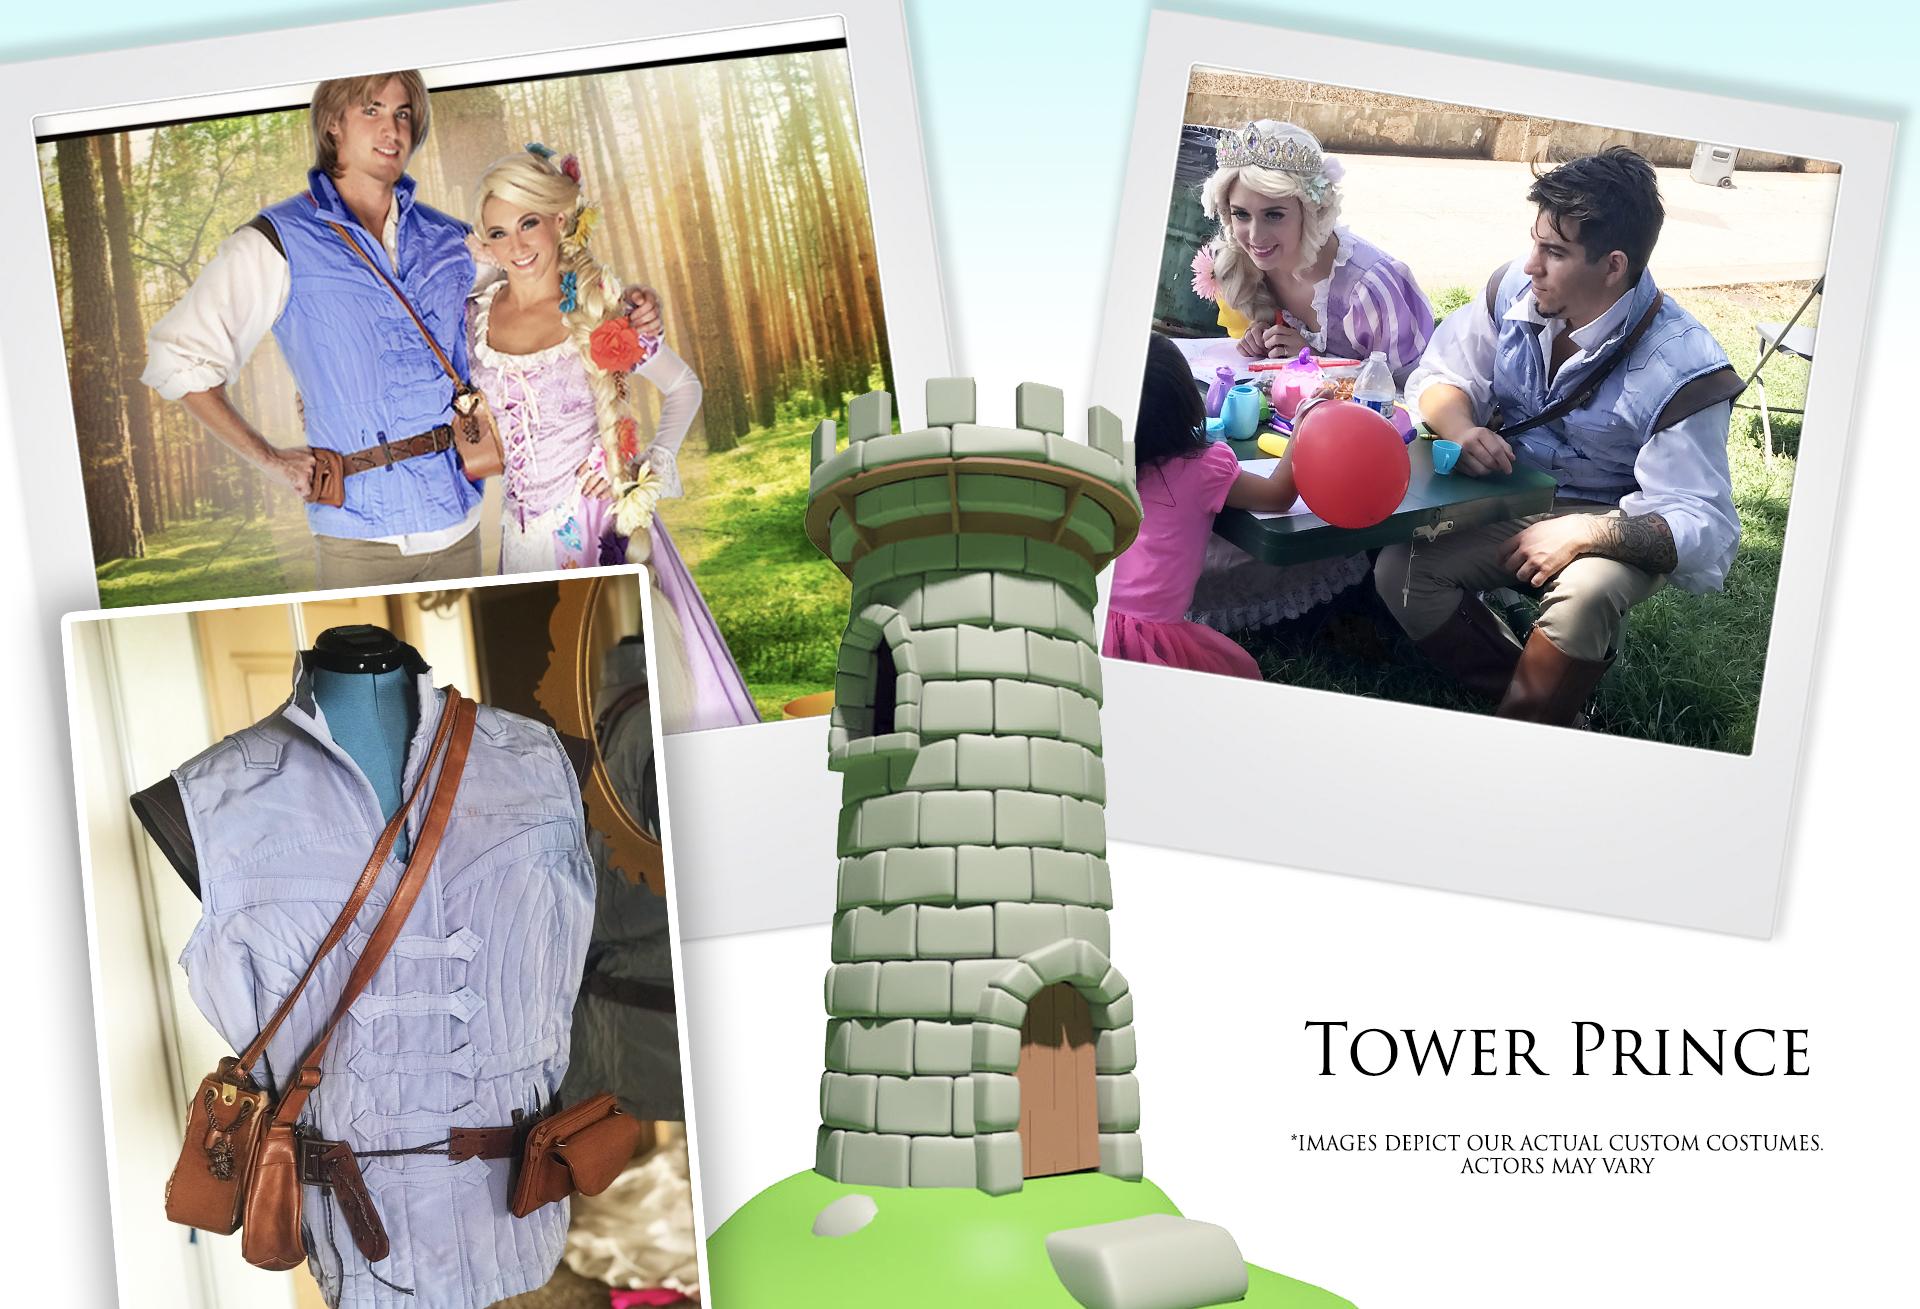 Tower Prince